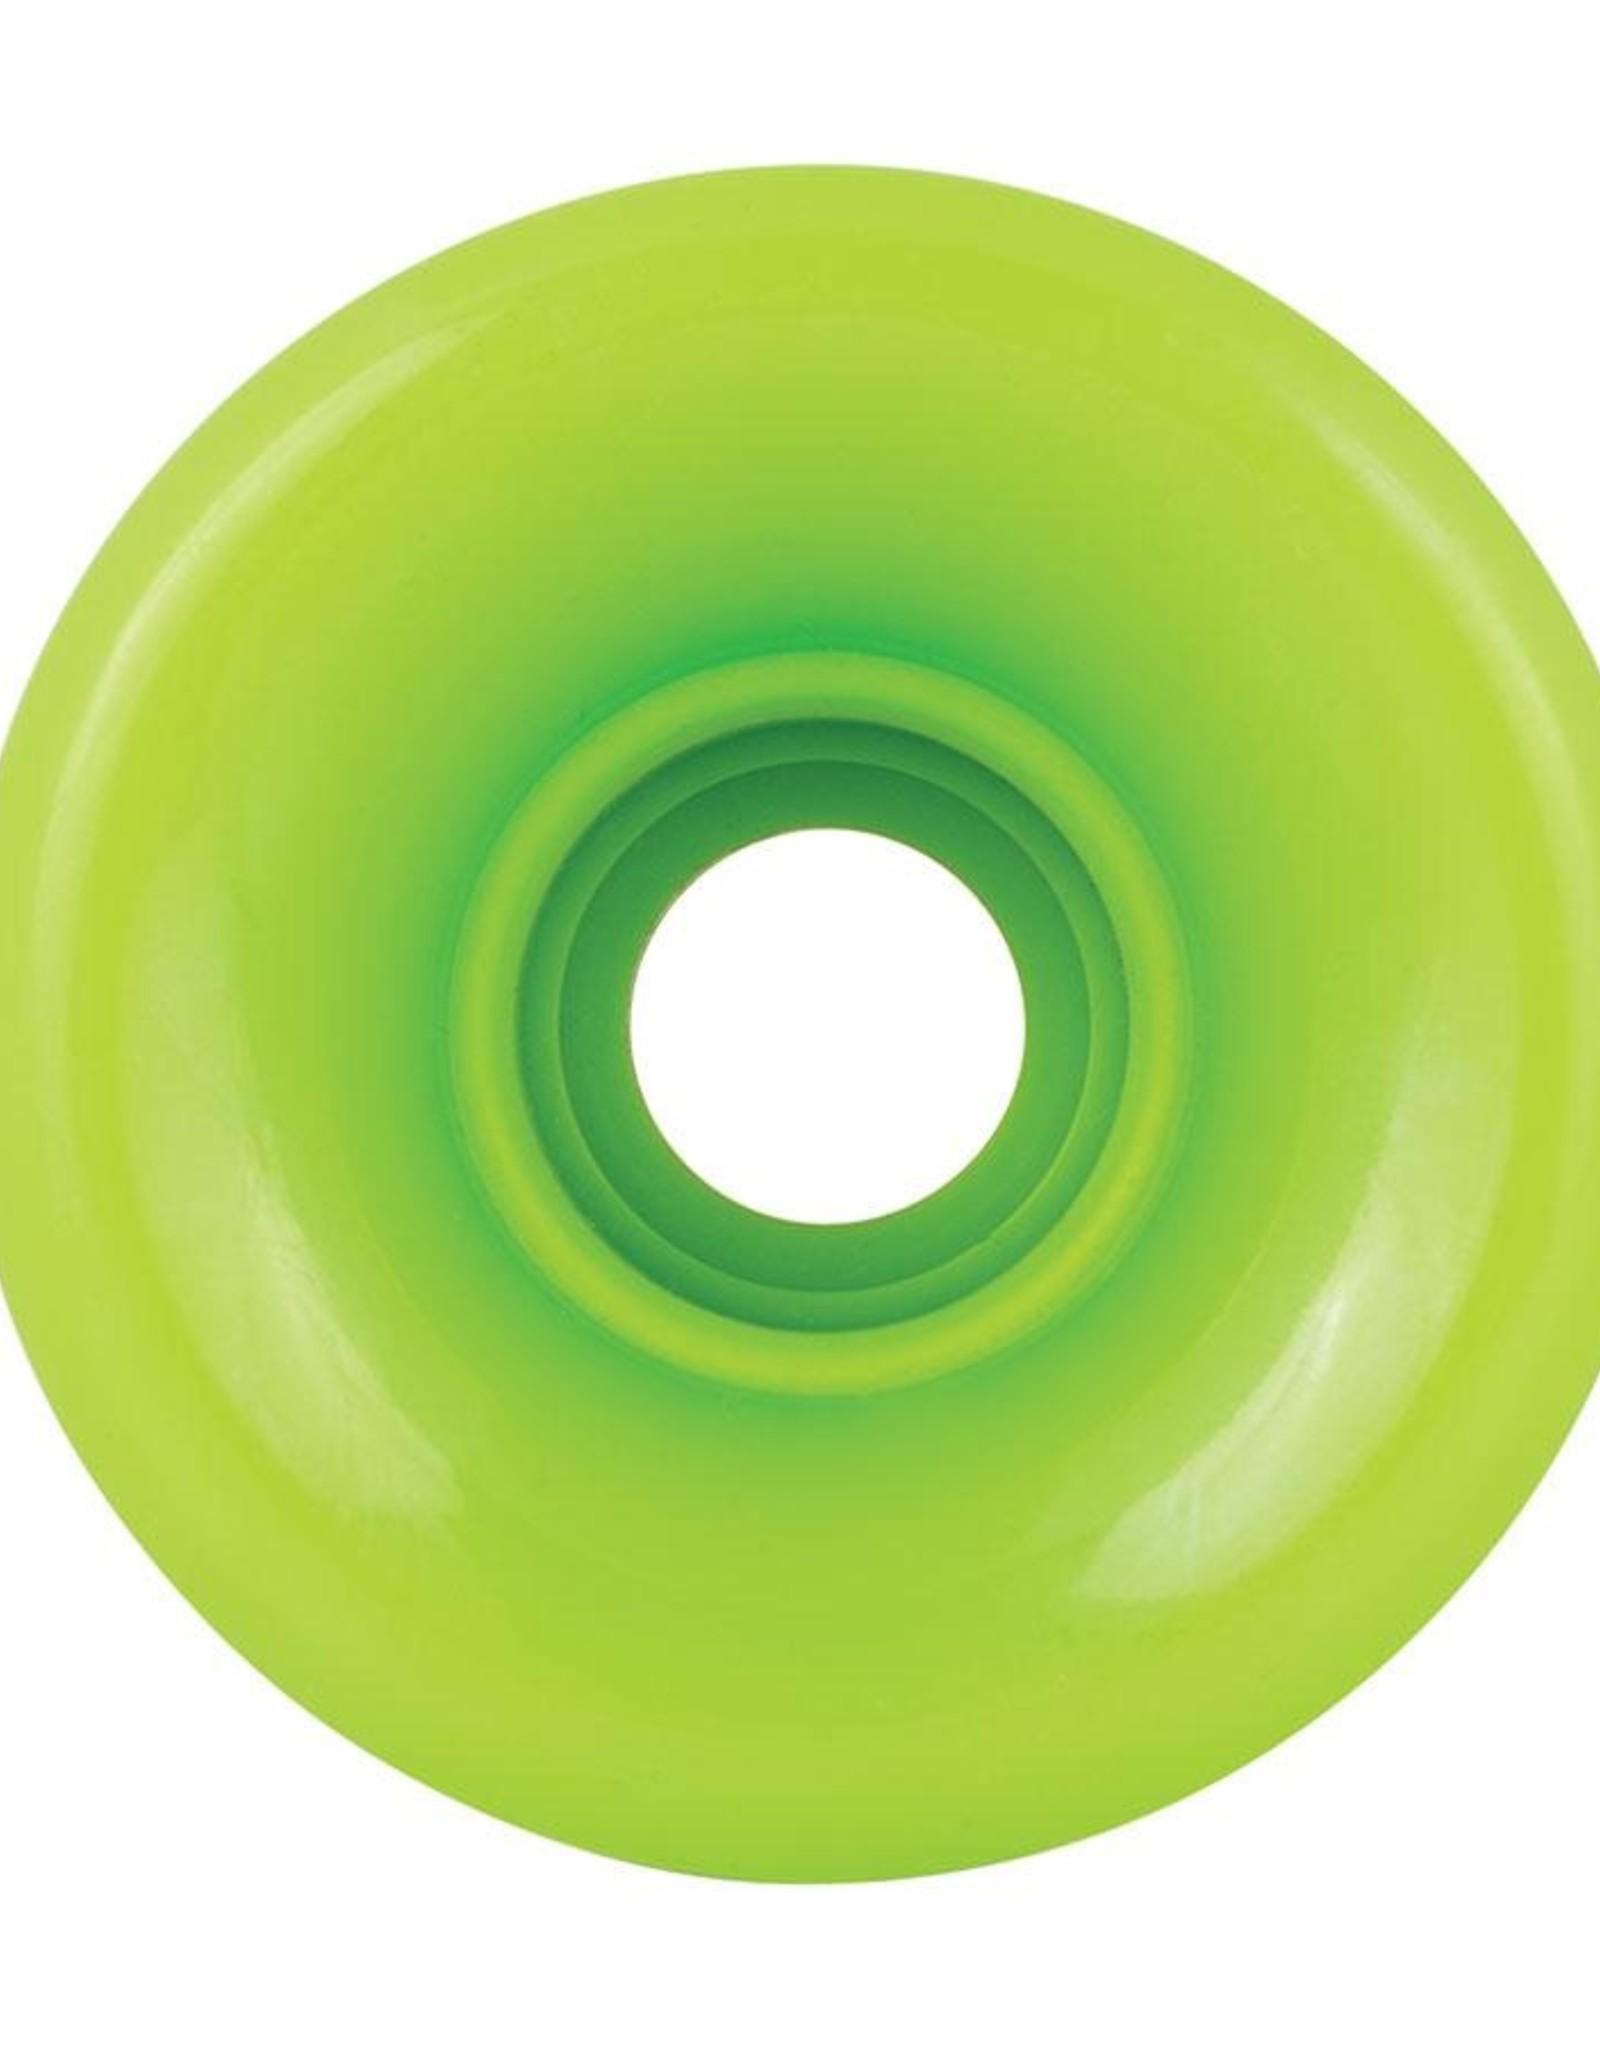 OJ'S OJS WHEELS SUPER JUICE GREEN 78A 60mm